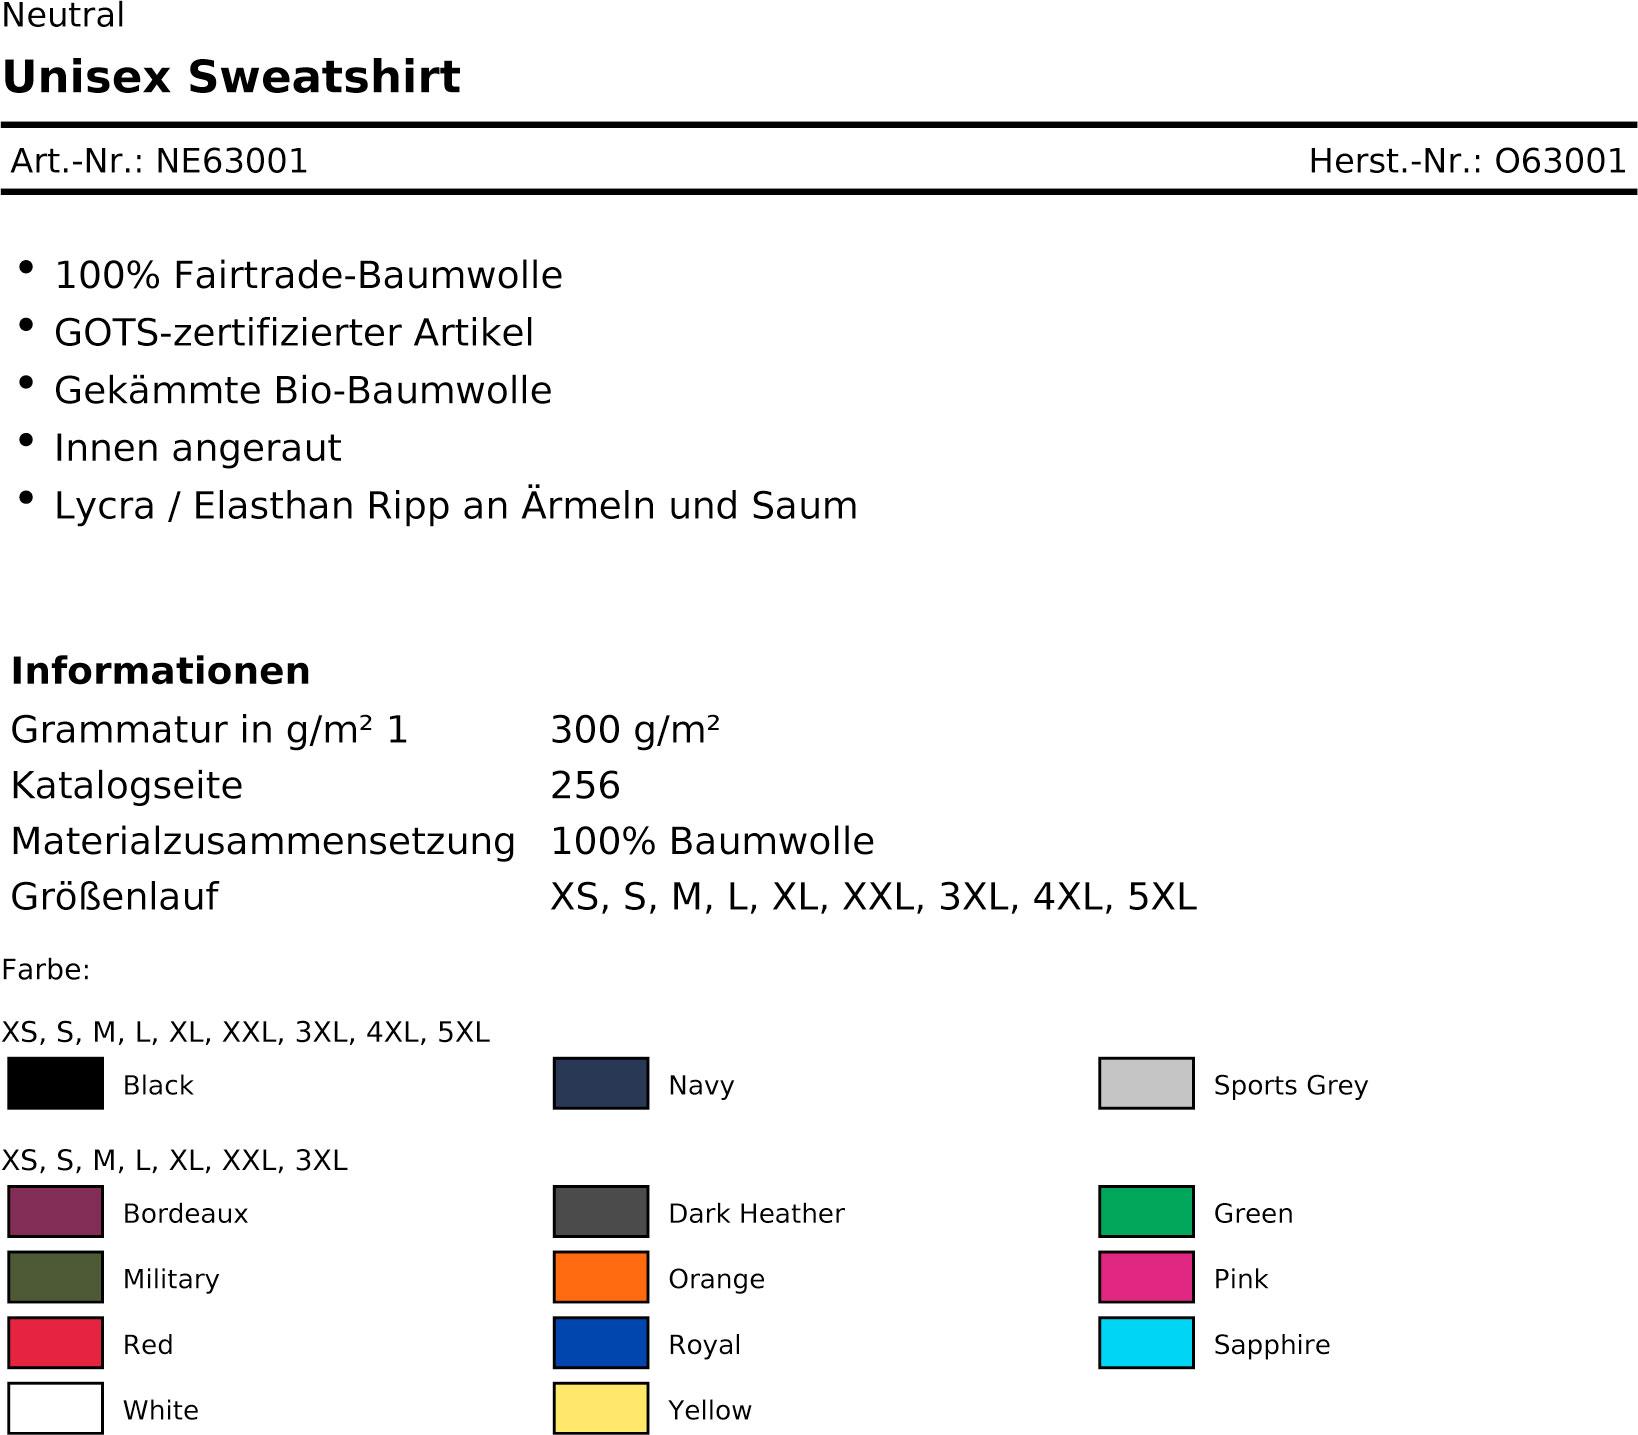 Unisex-Sweatshirt-Ne63001